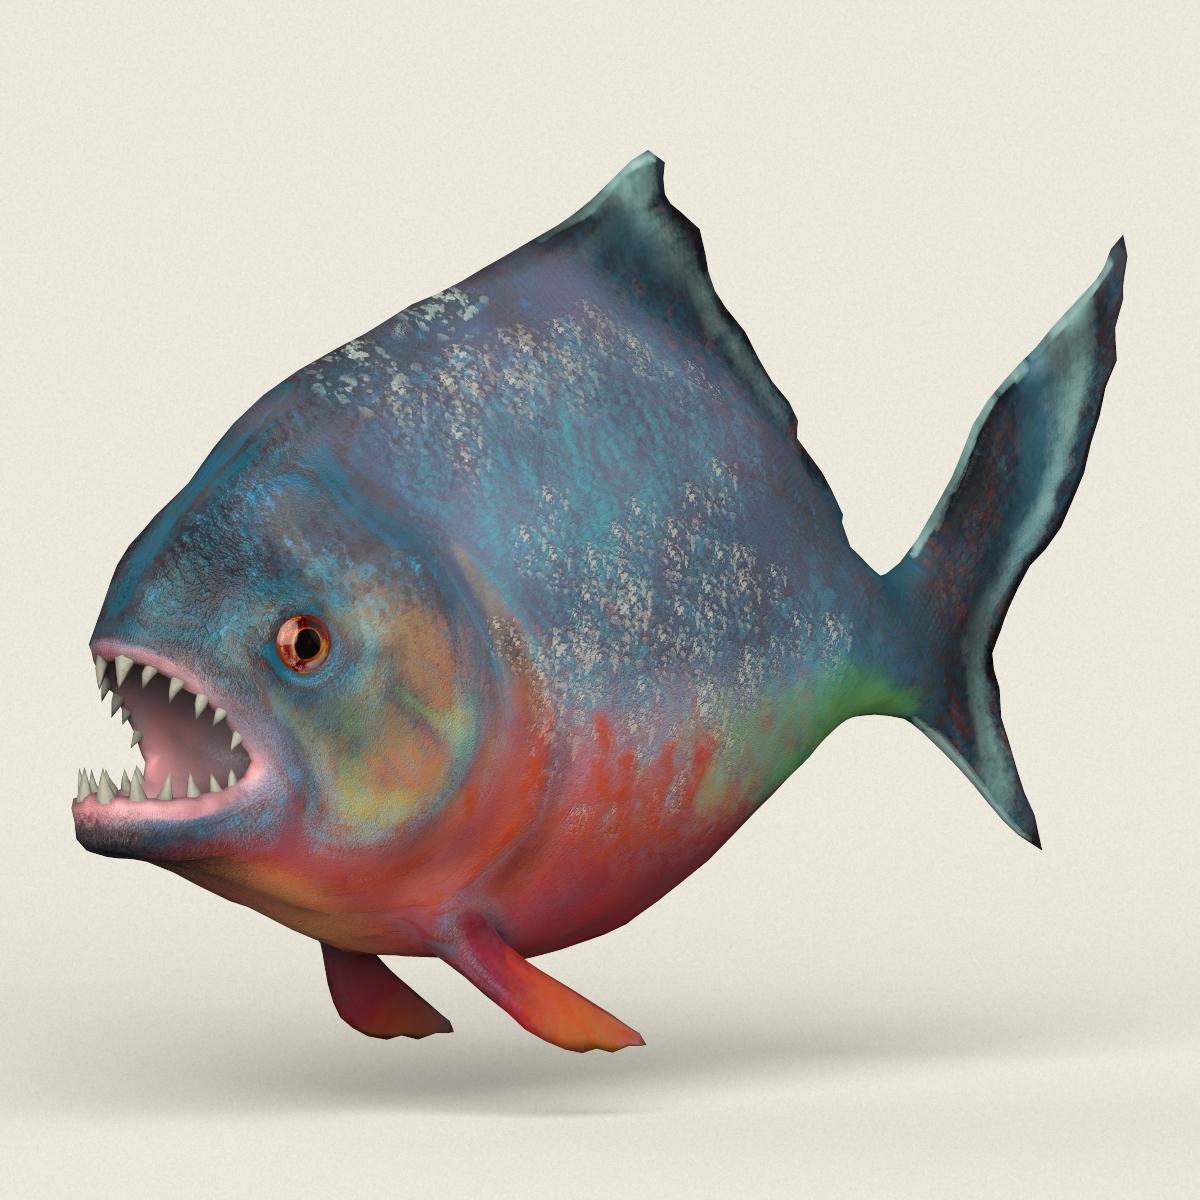 Low poly Realistic Piranha